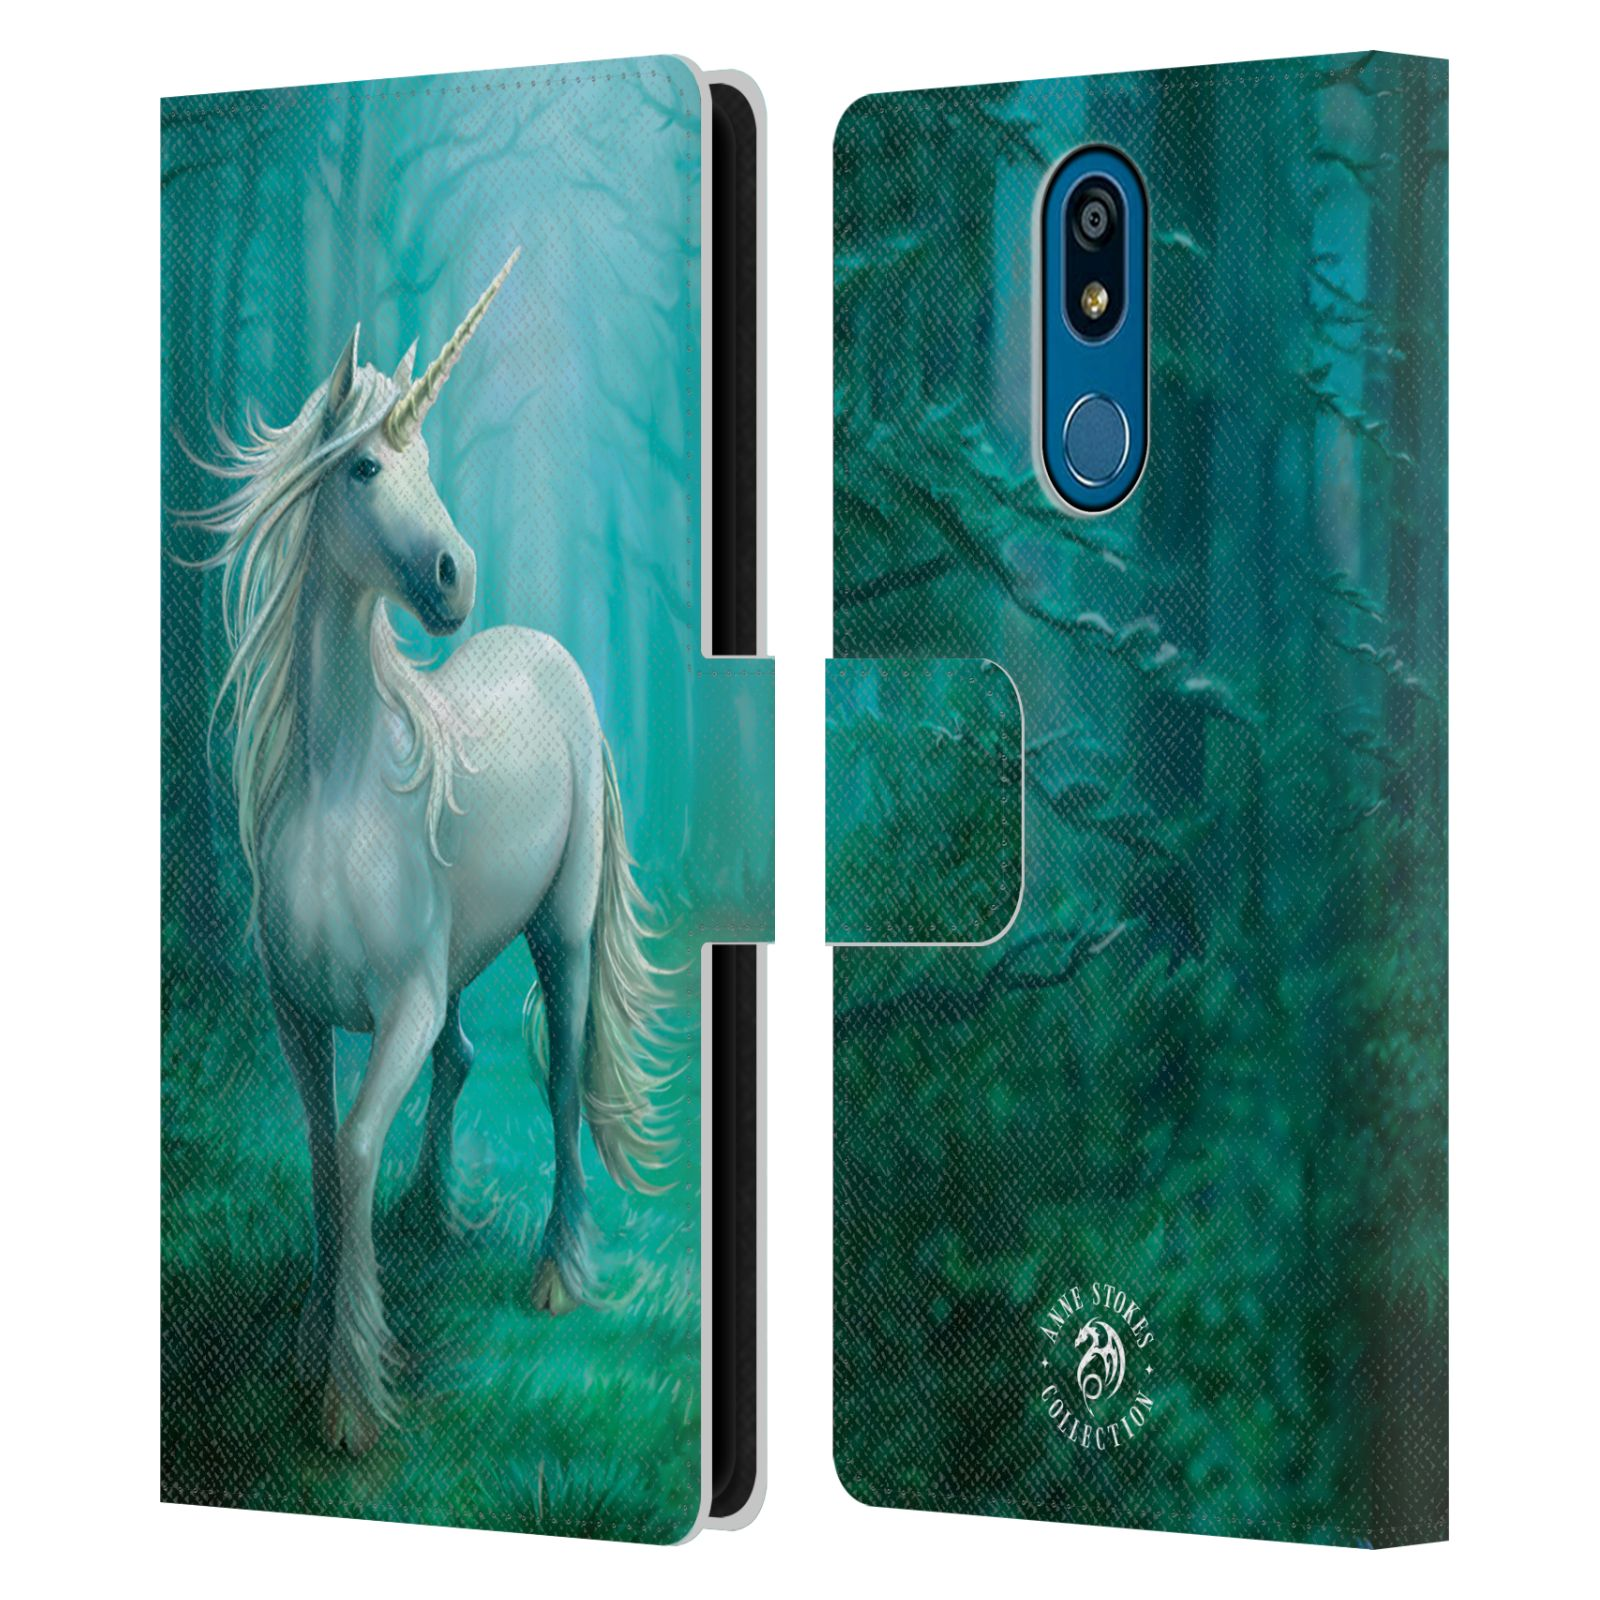 Pouzdro na mobil LG K40 - Head Case - fantasy - jednorožec v lese